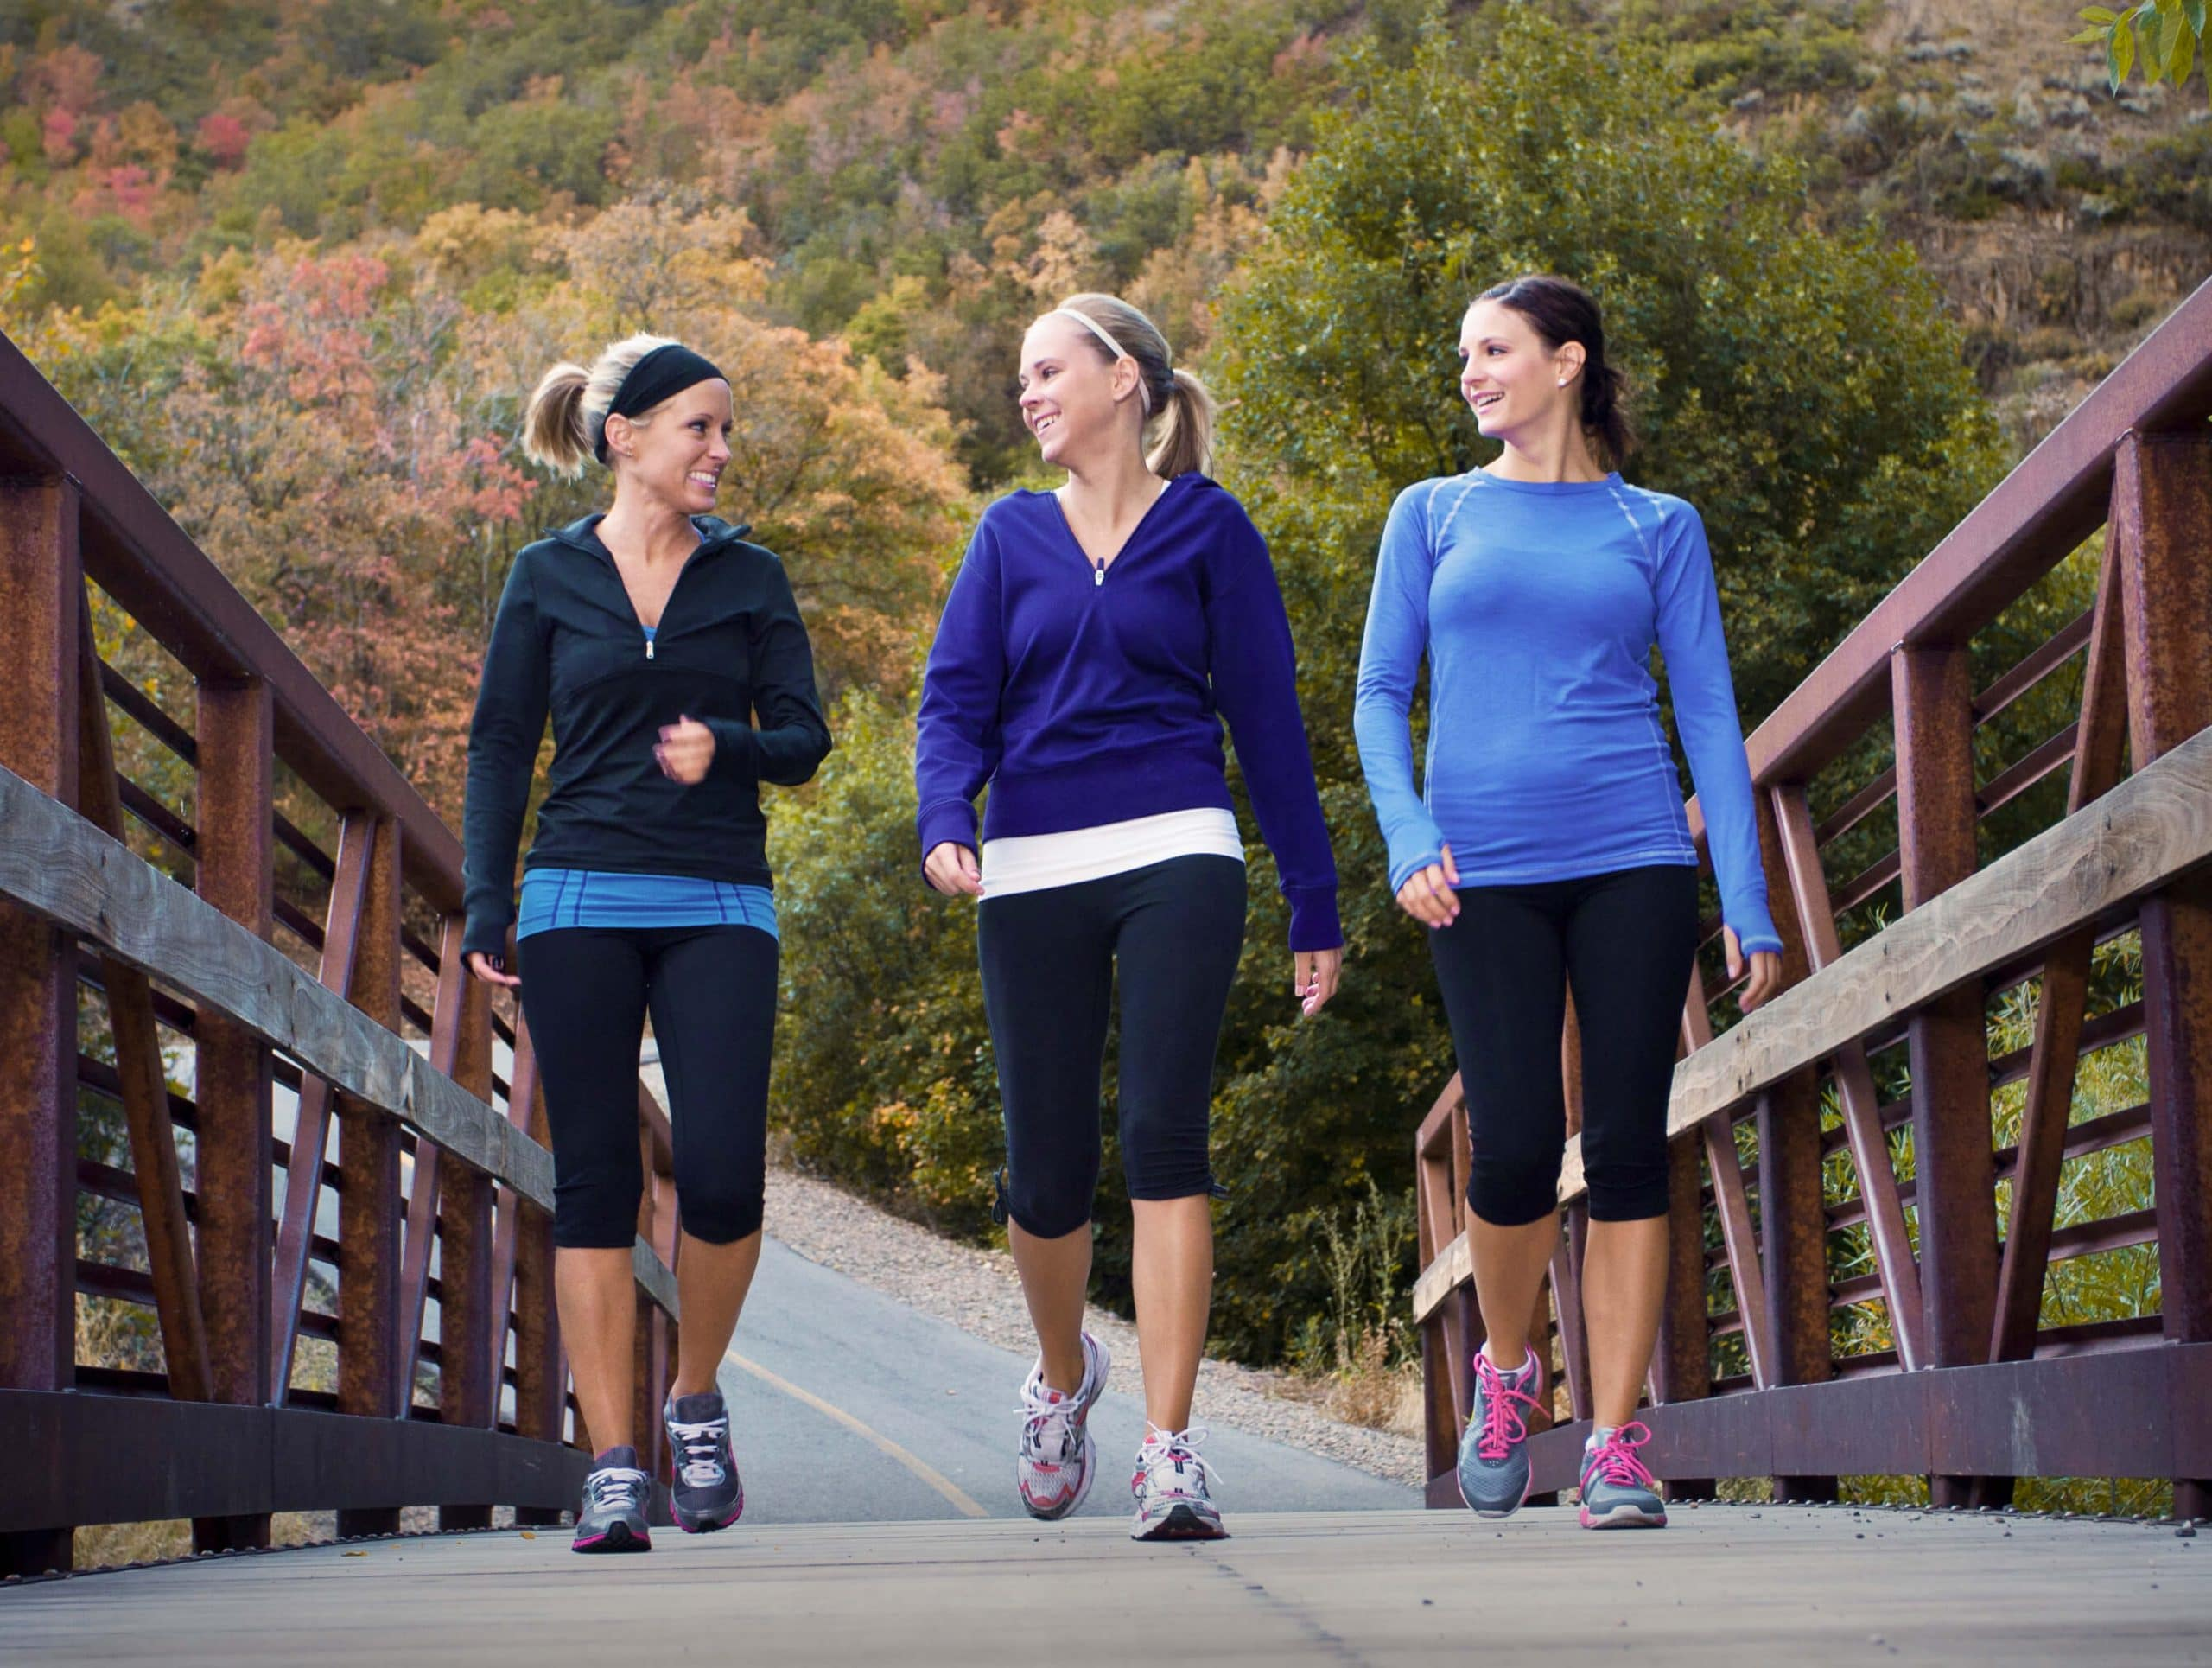 Ladies Doing Walking Exercise - Fitness Expo